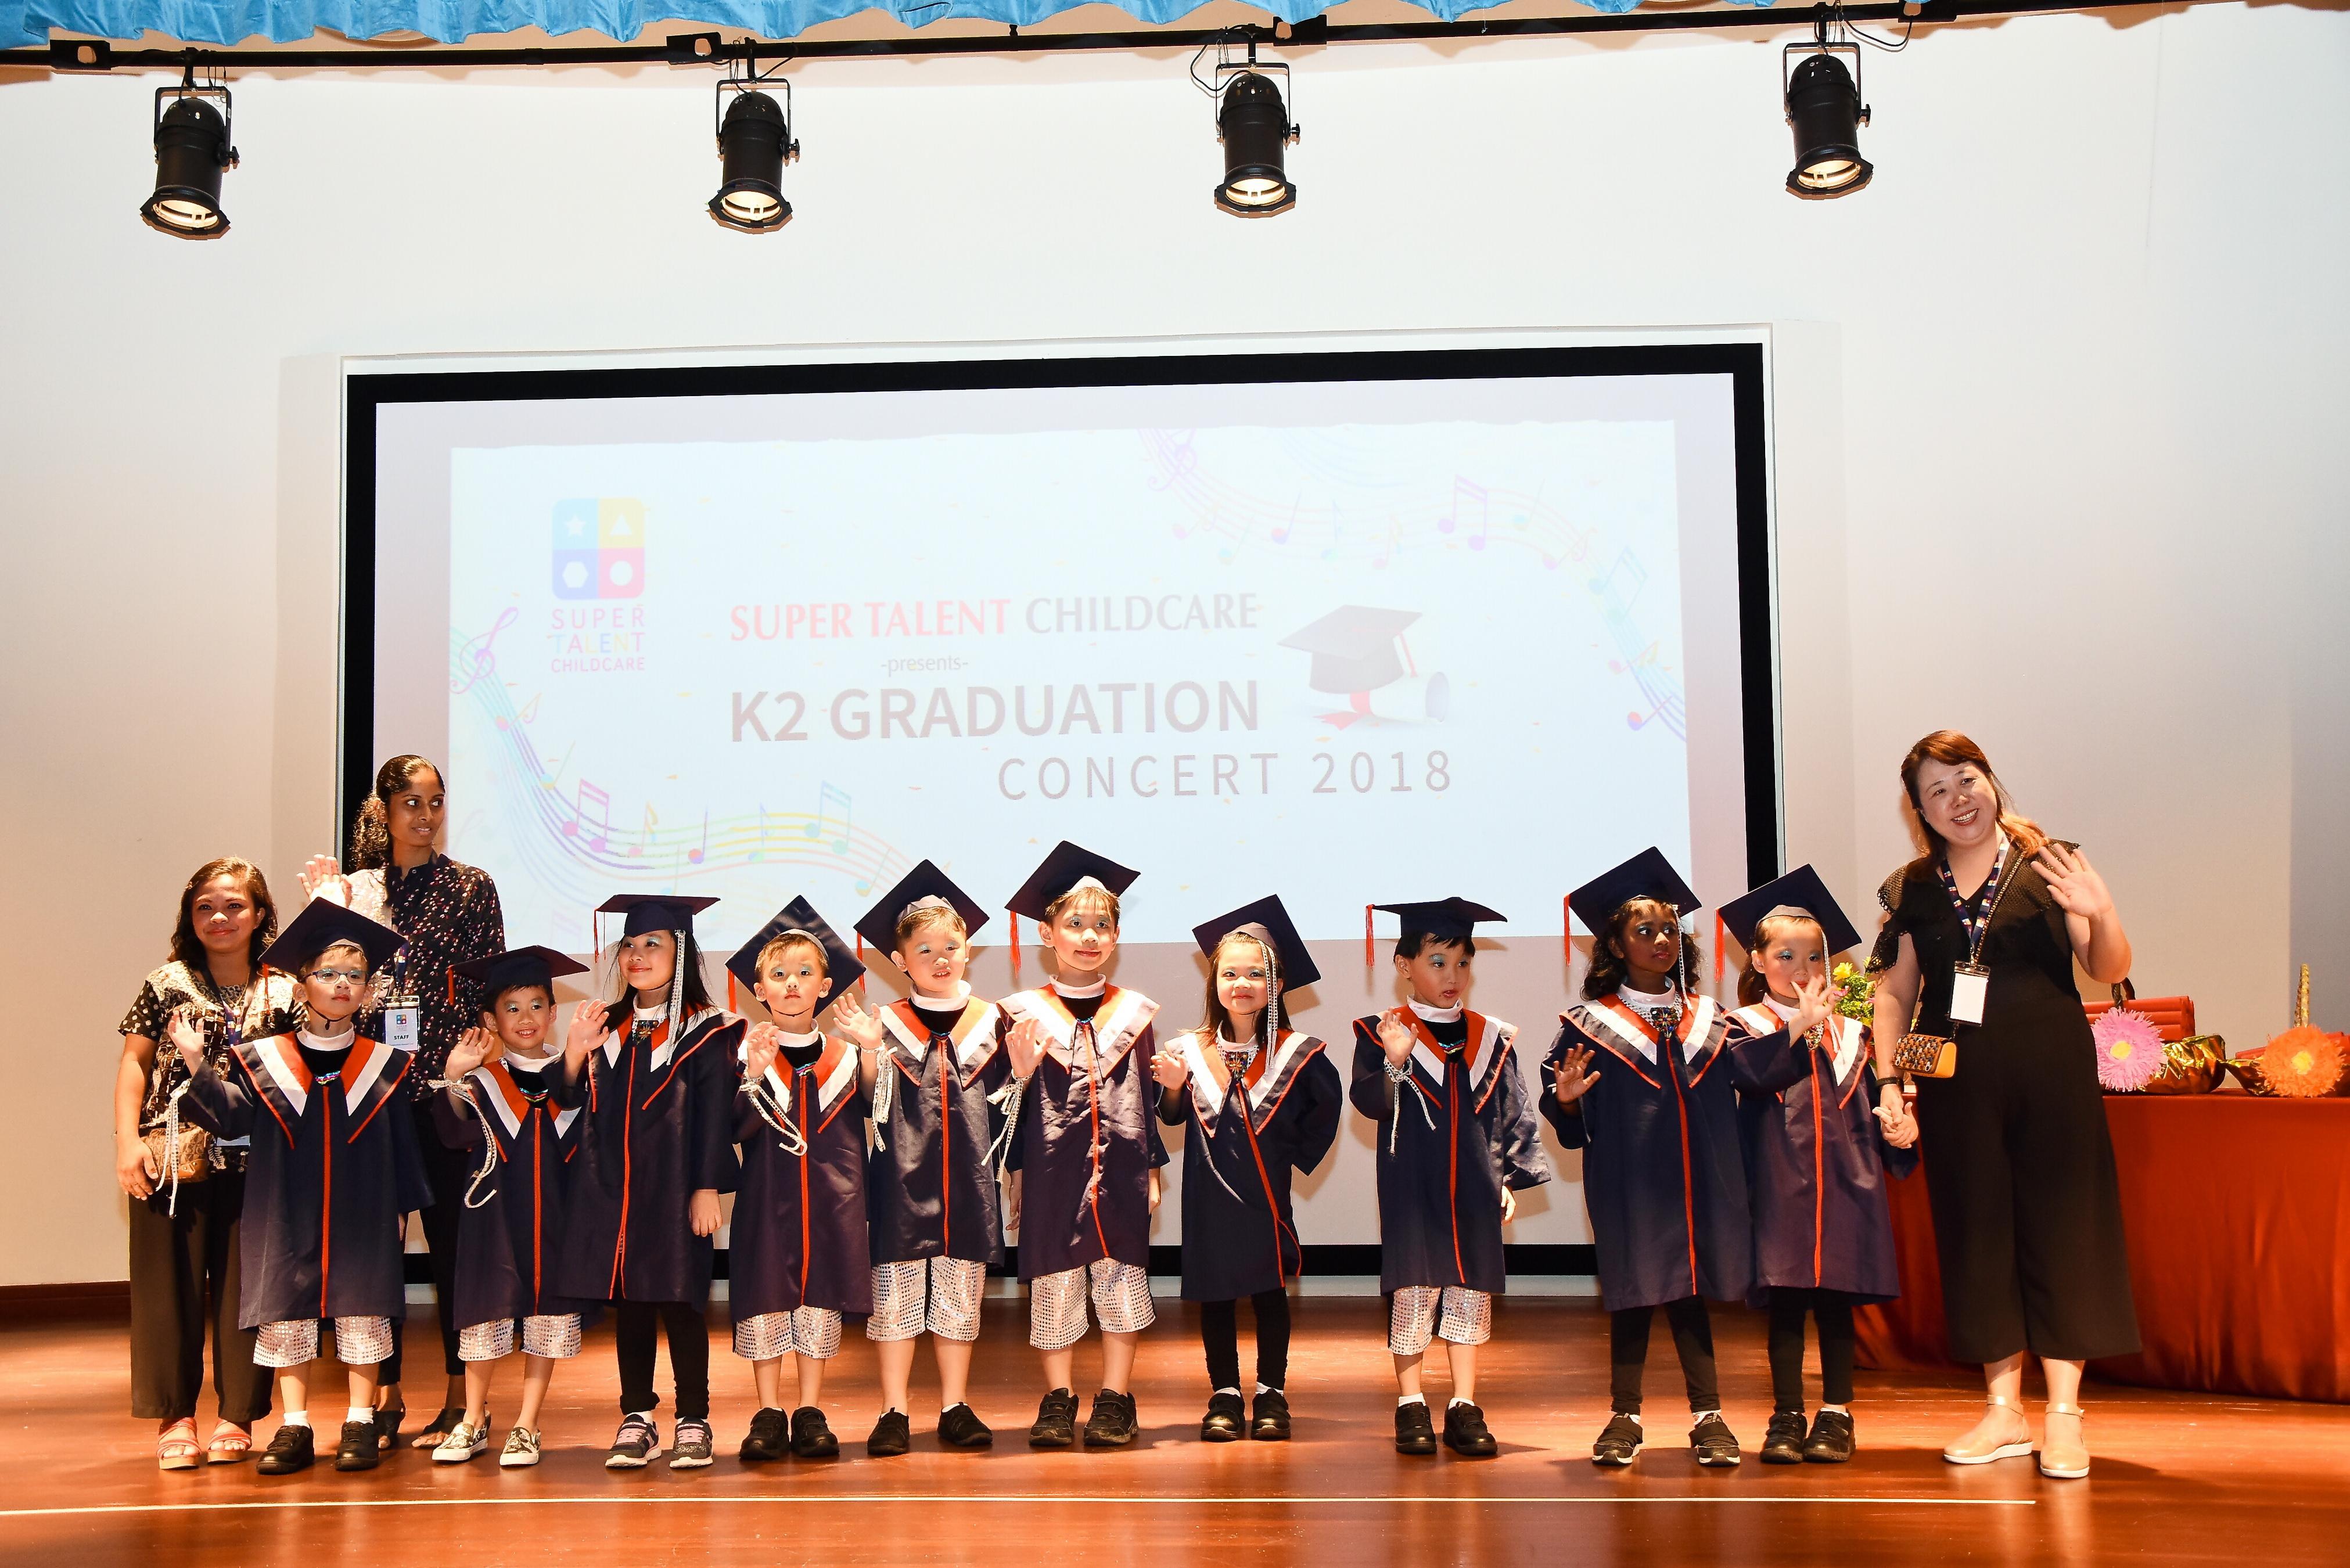 K2 Graduation Concert 2018 2